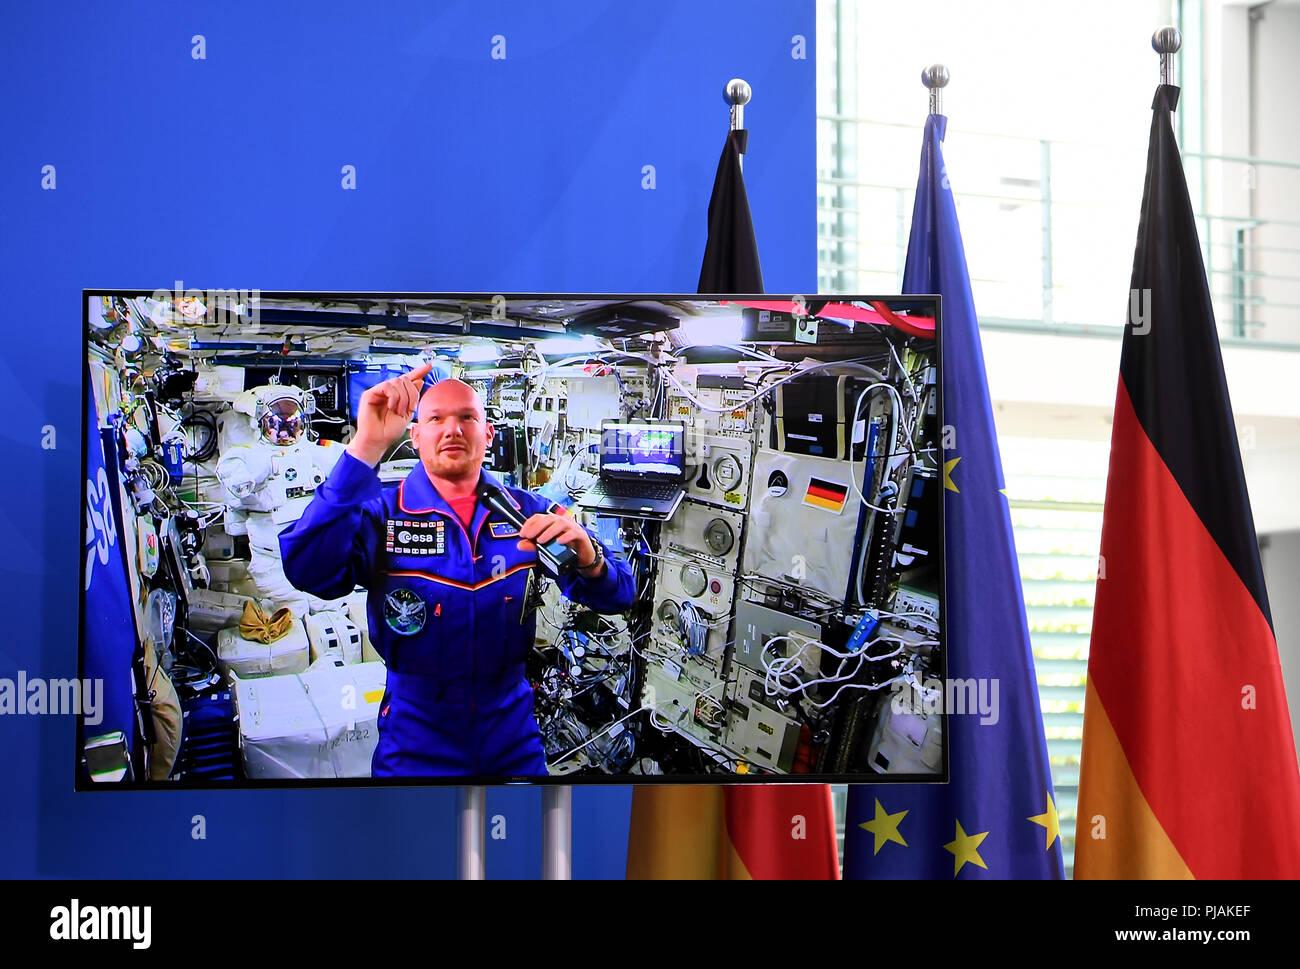 astronaut space crusade berlin - photo #33